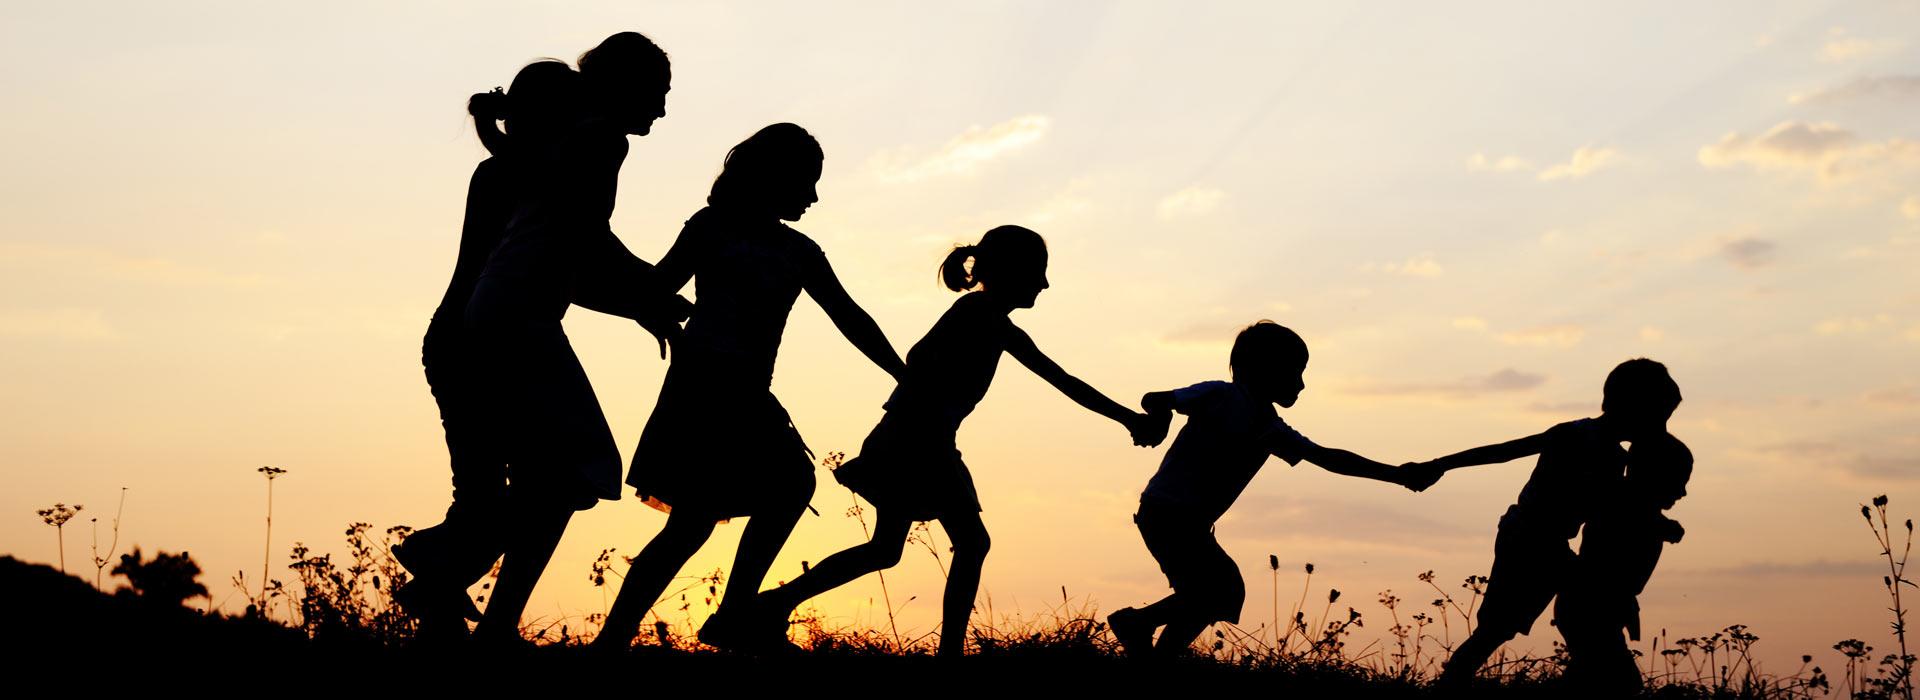 Detská a adoslescentná ortopédia